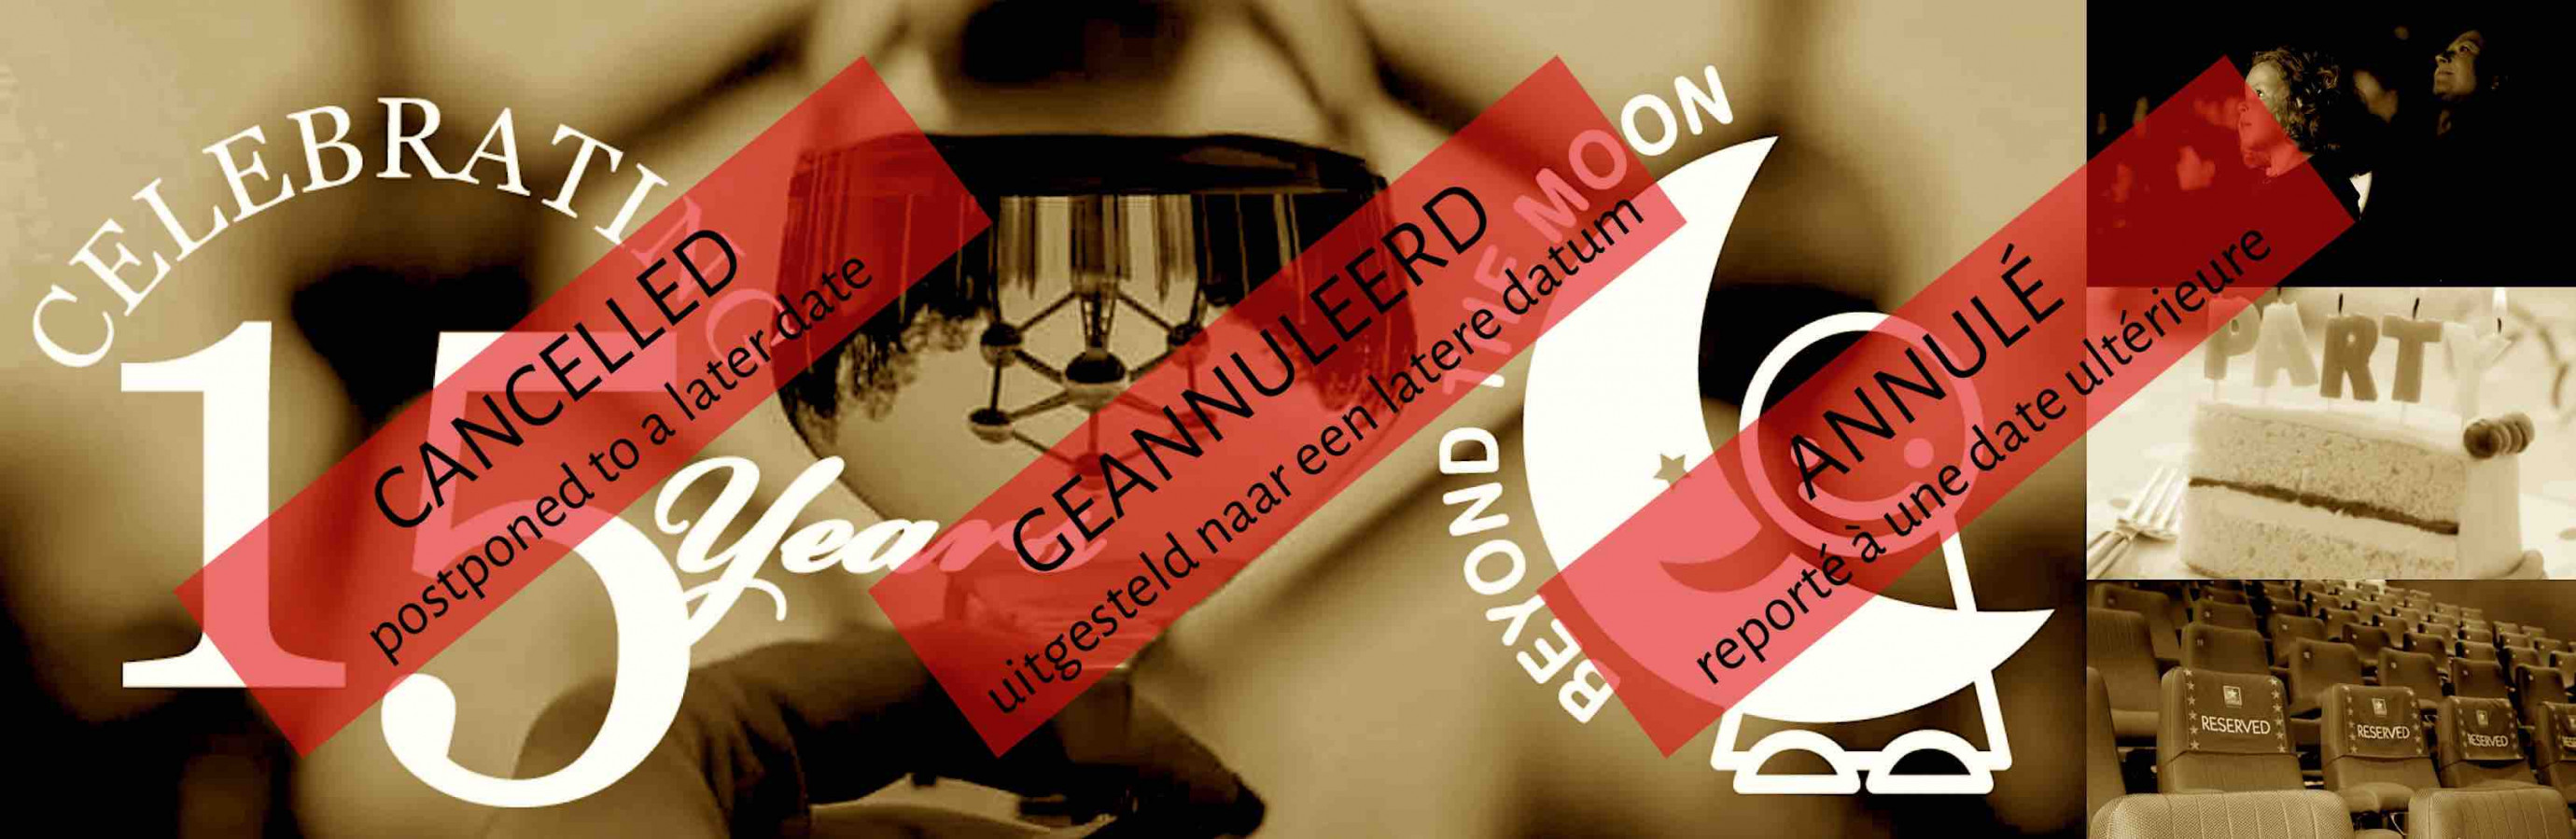 web cover_sepia cancelled_LR.jpg